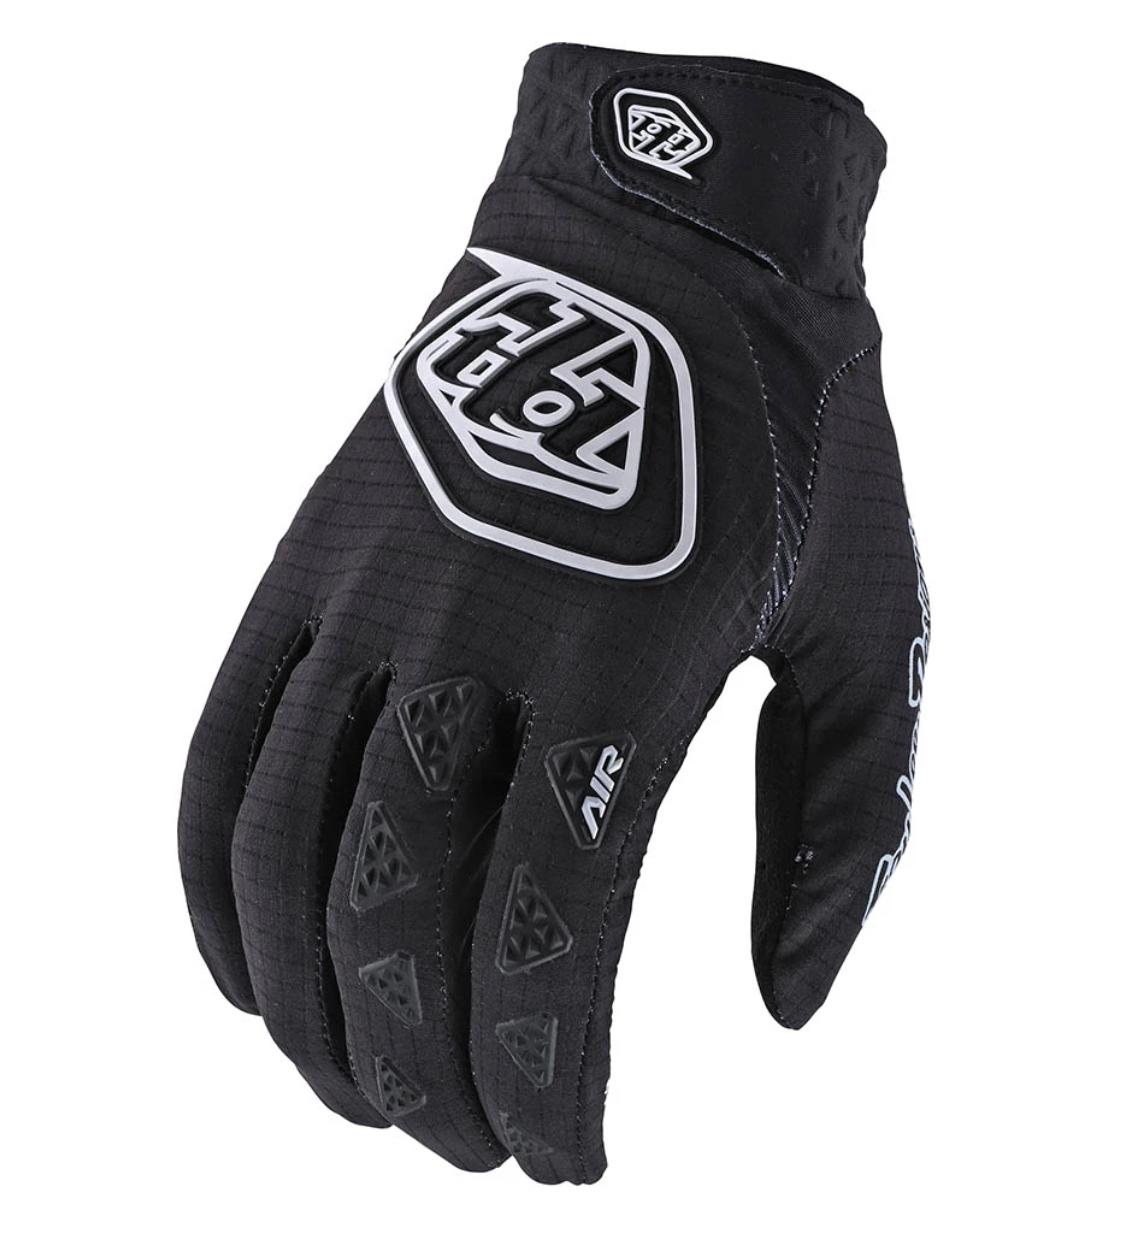 Troy Lee DesignsAir Glove Youth Black